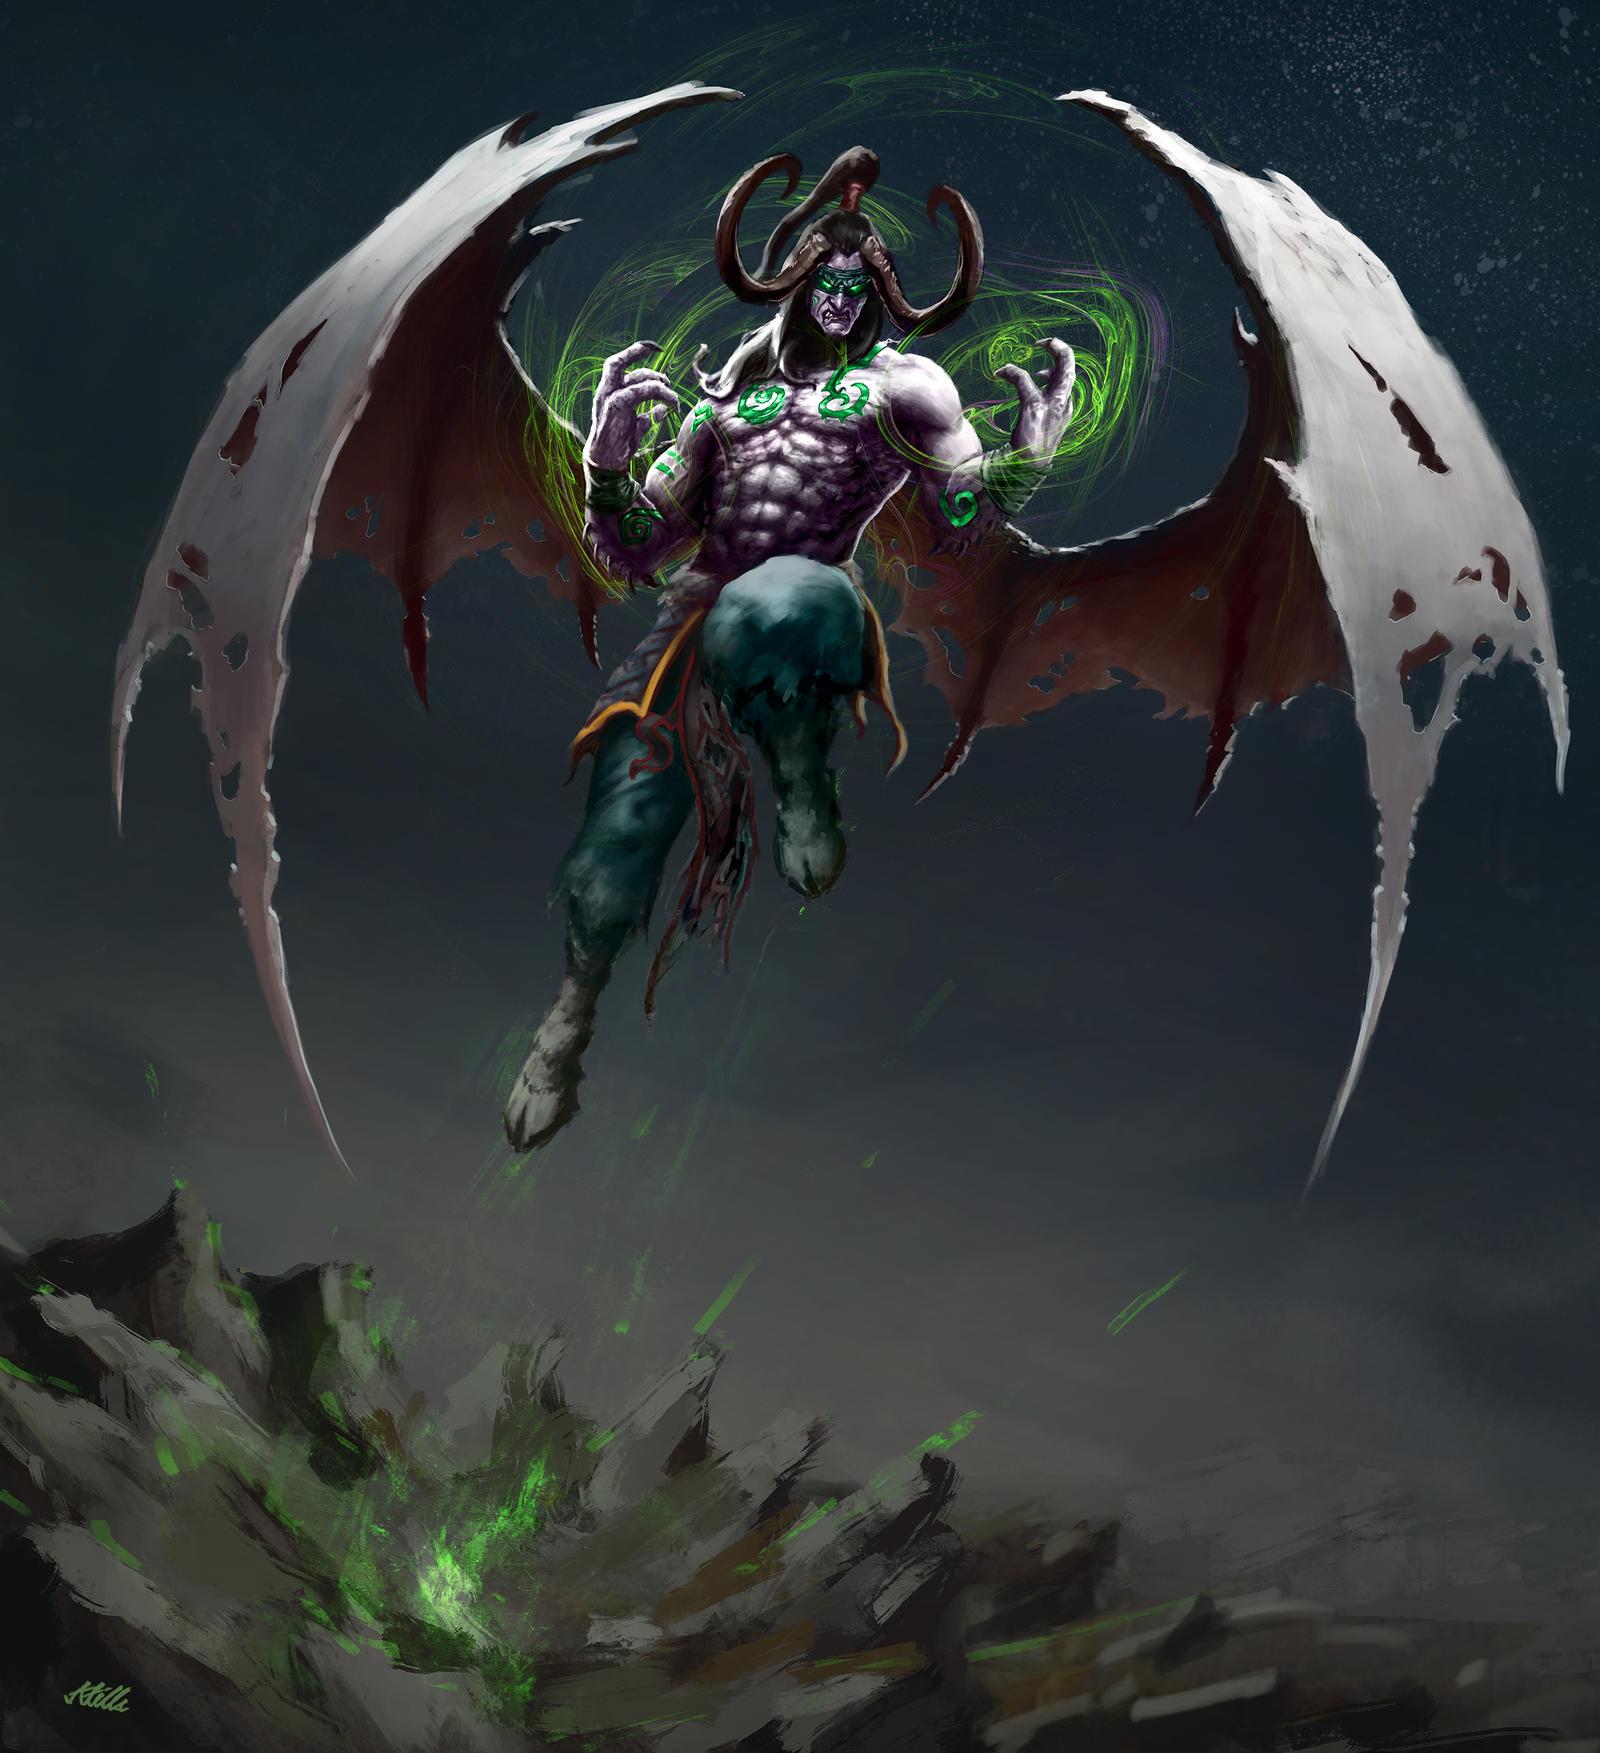 Illidan Stormrage by Apocalypse-tr on DeviantArt